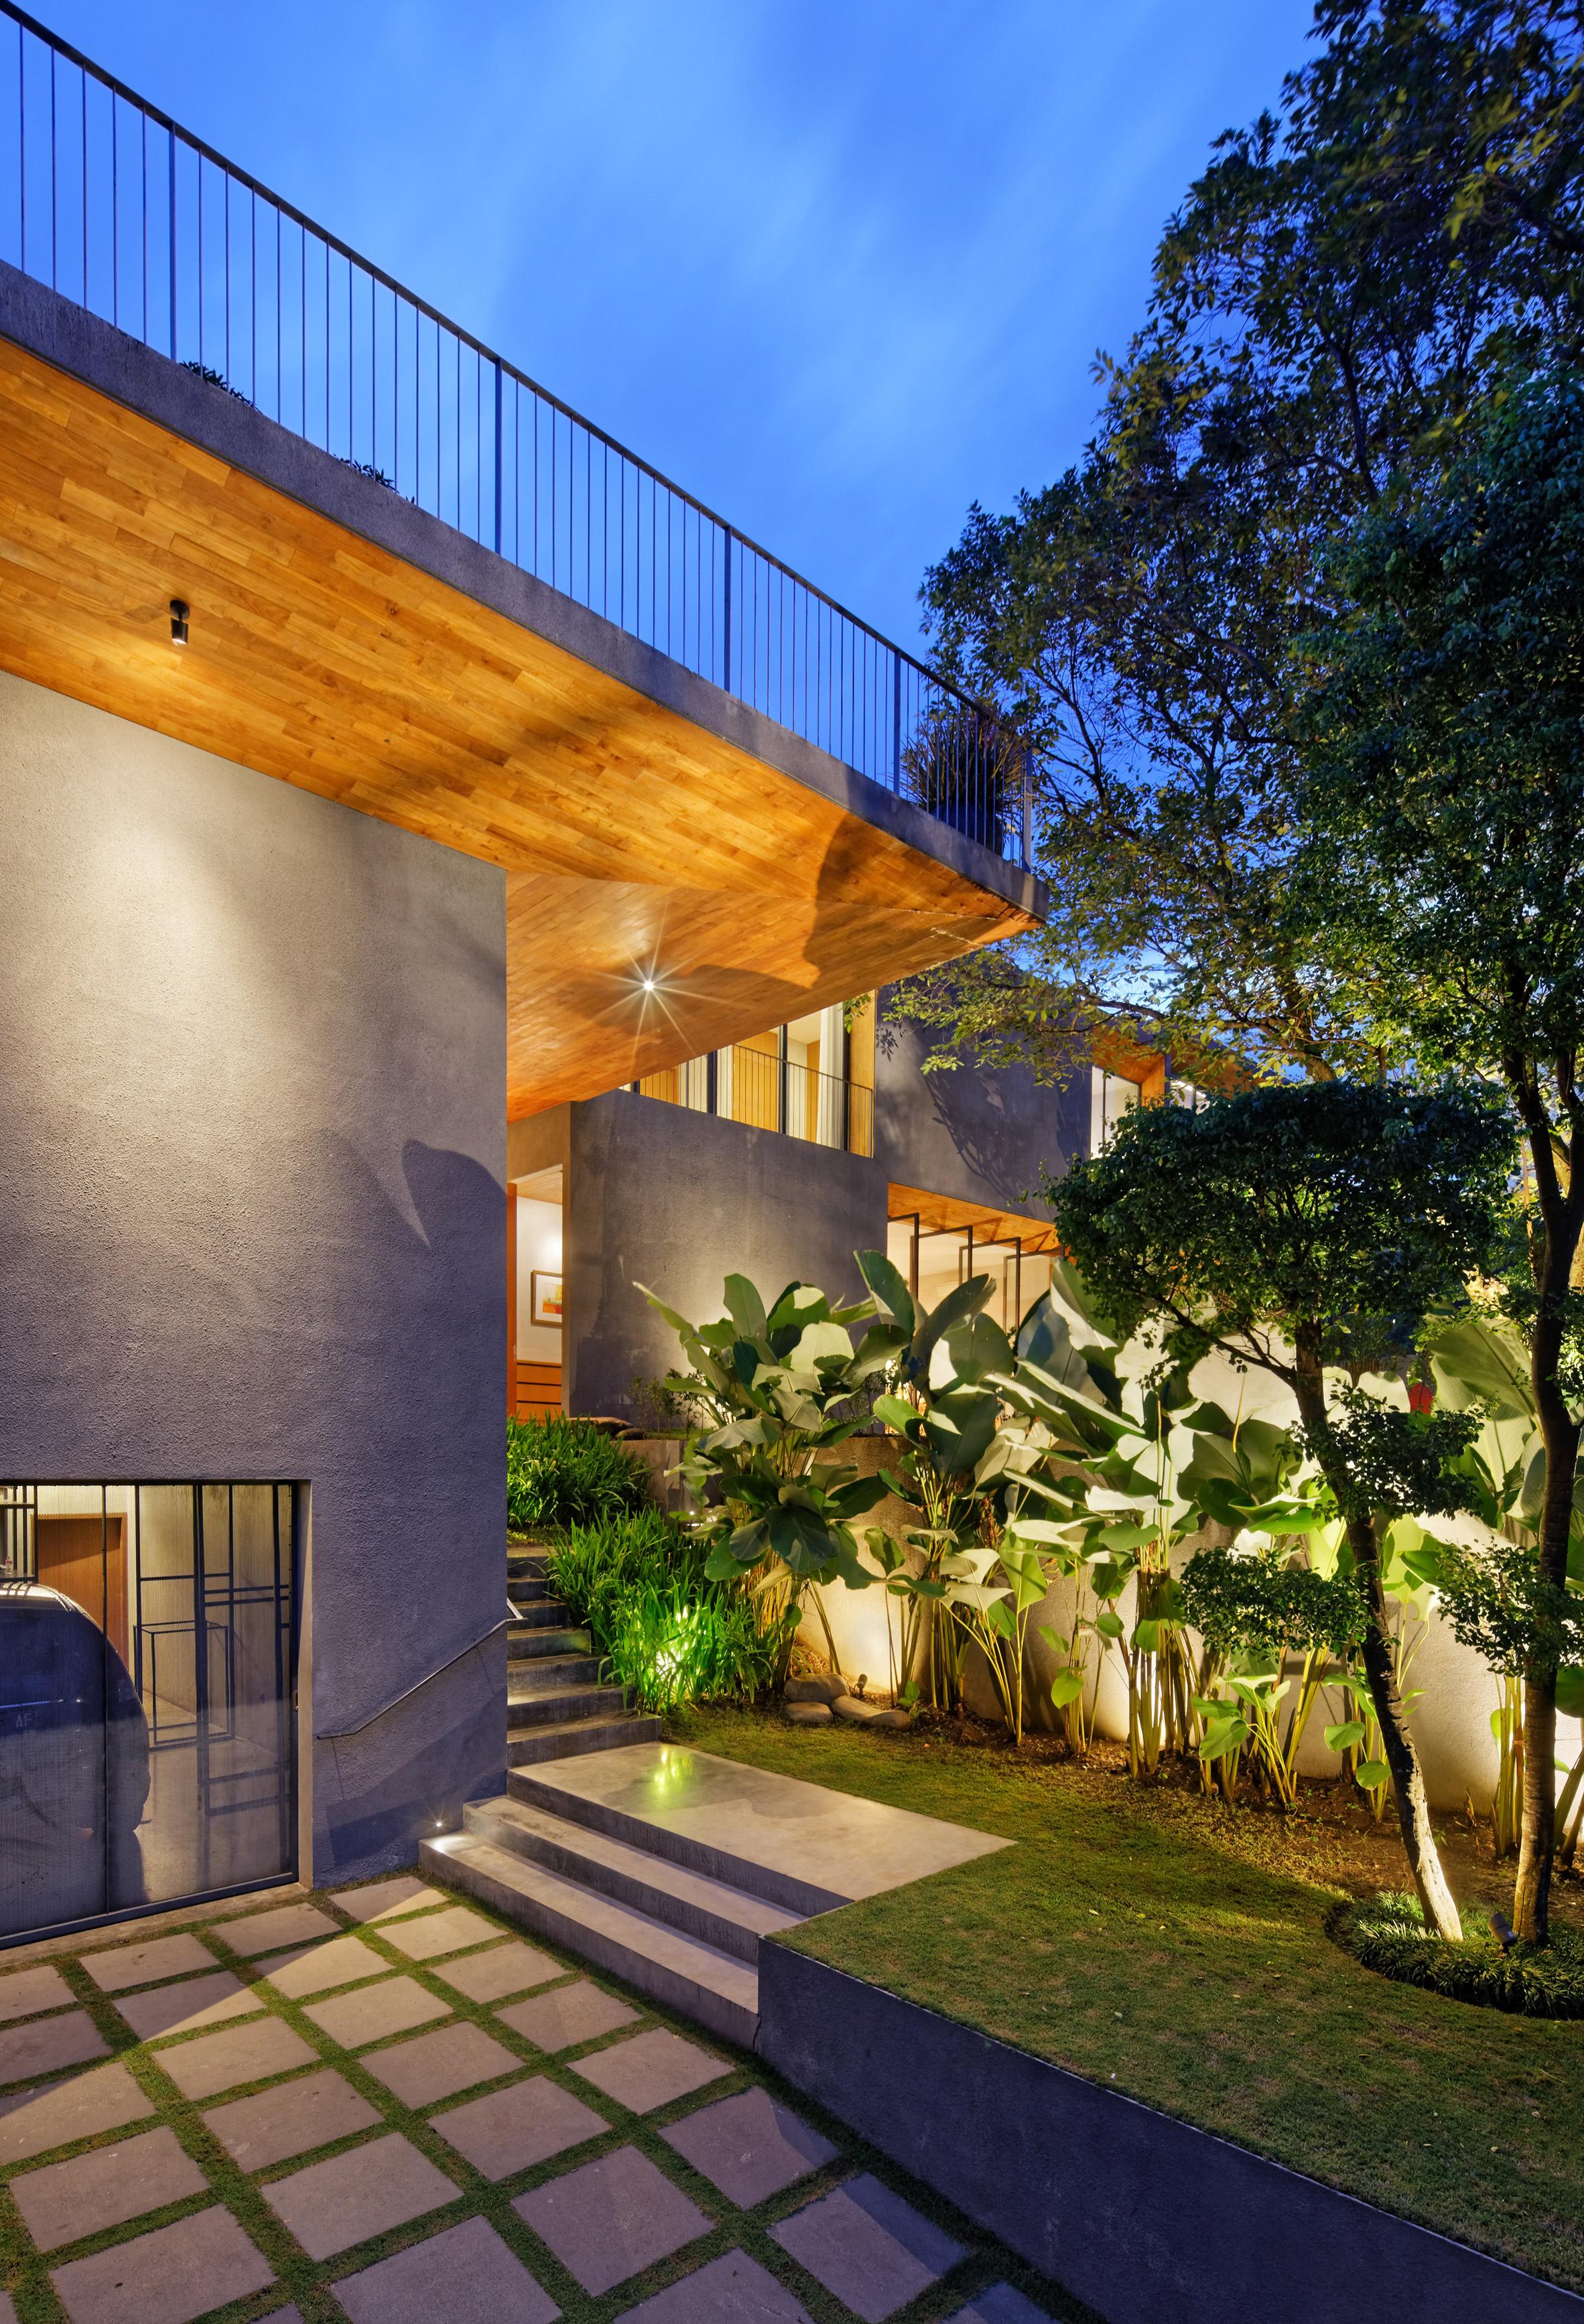 house-inside-outside-tamara-wibowo-architecture-residential-indonesia_dezeen_2364_col_16.jpg